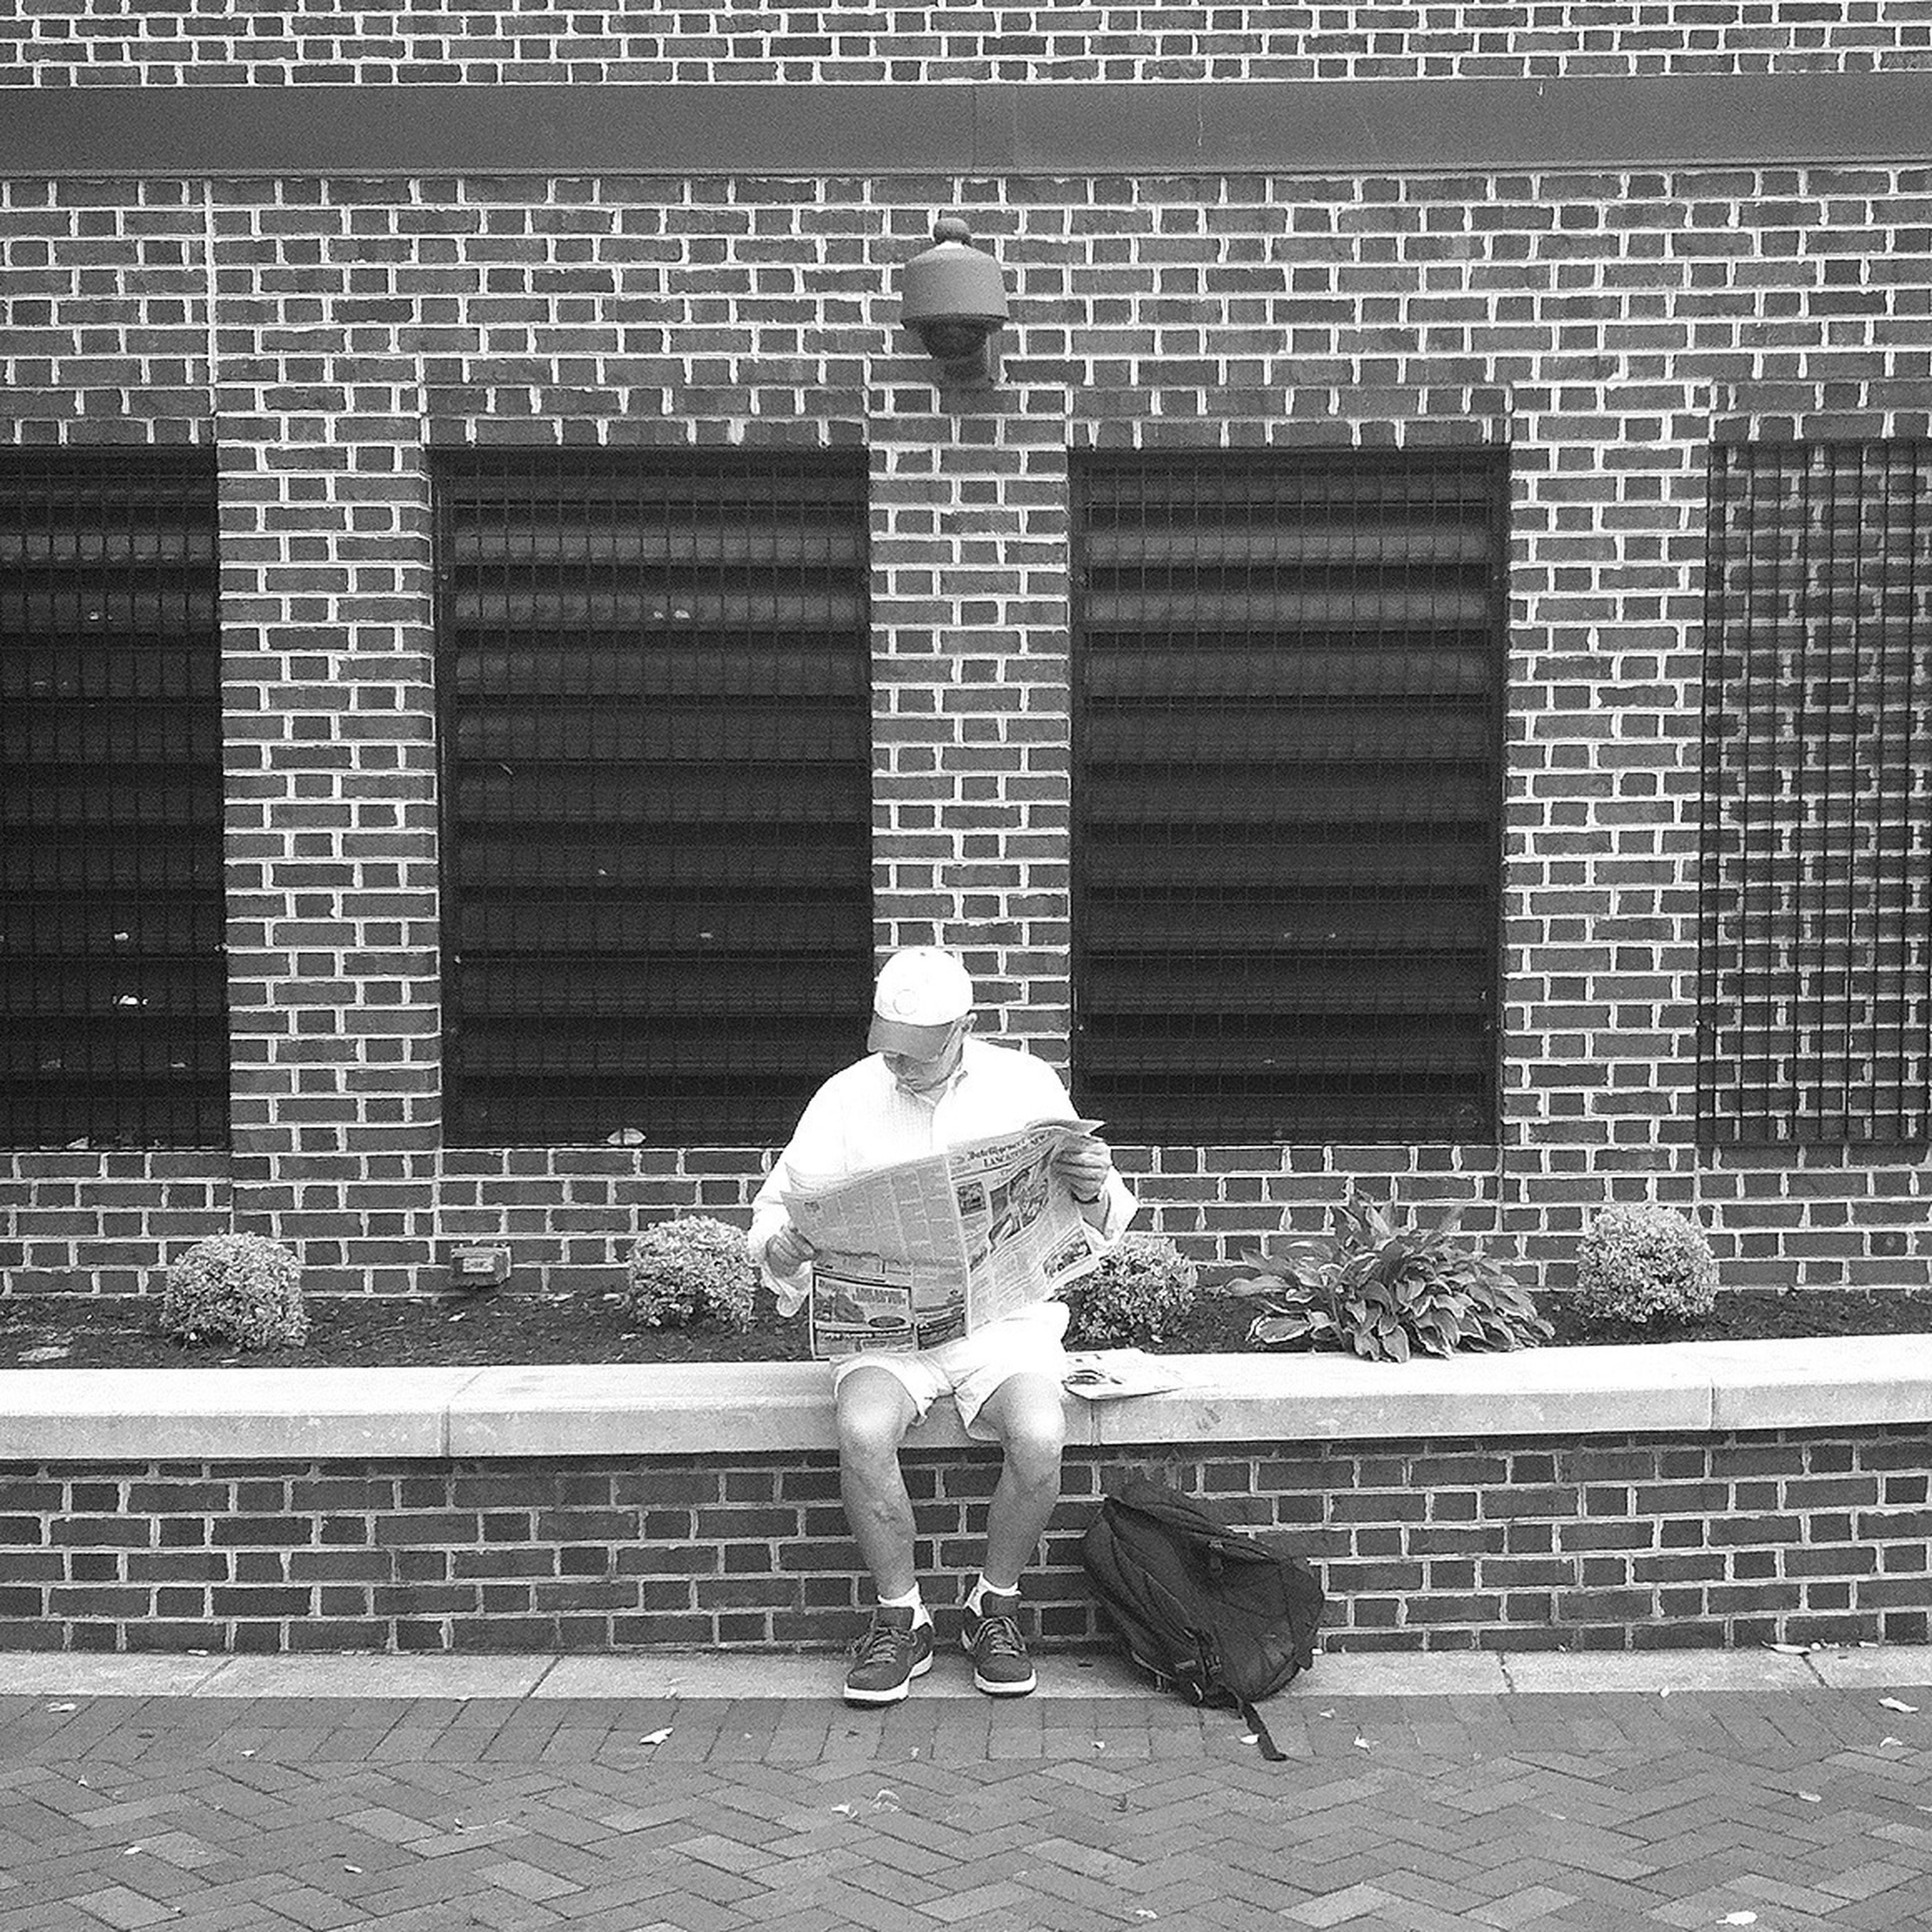 Streetphoto_bw Streetphotography Blackandwhite Shootermag